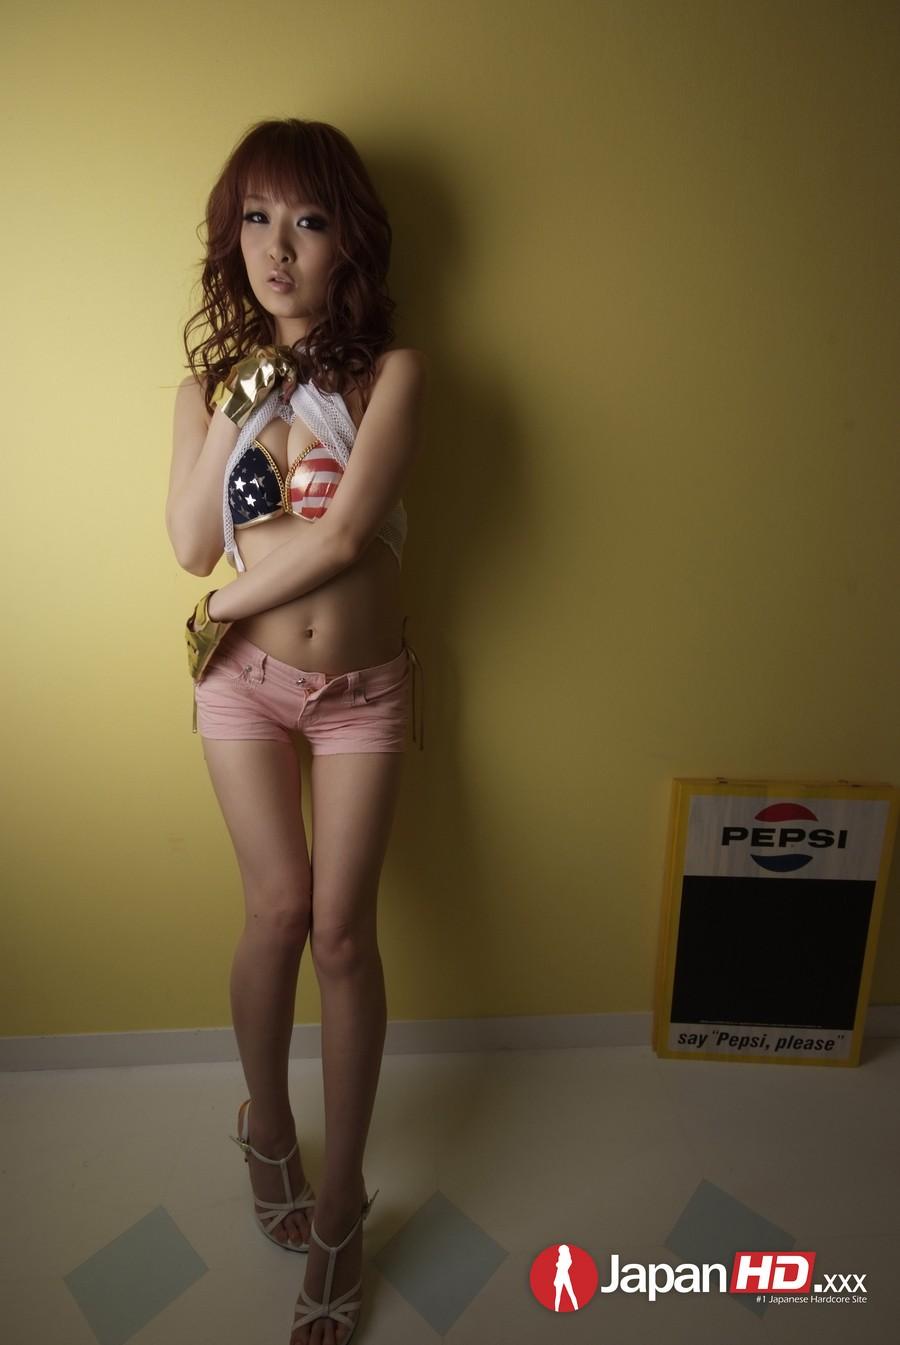 Realize, Grown nudist girl model entertaining phrase